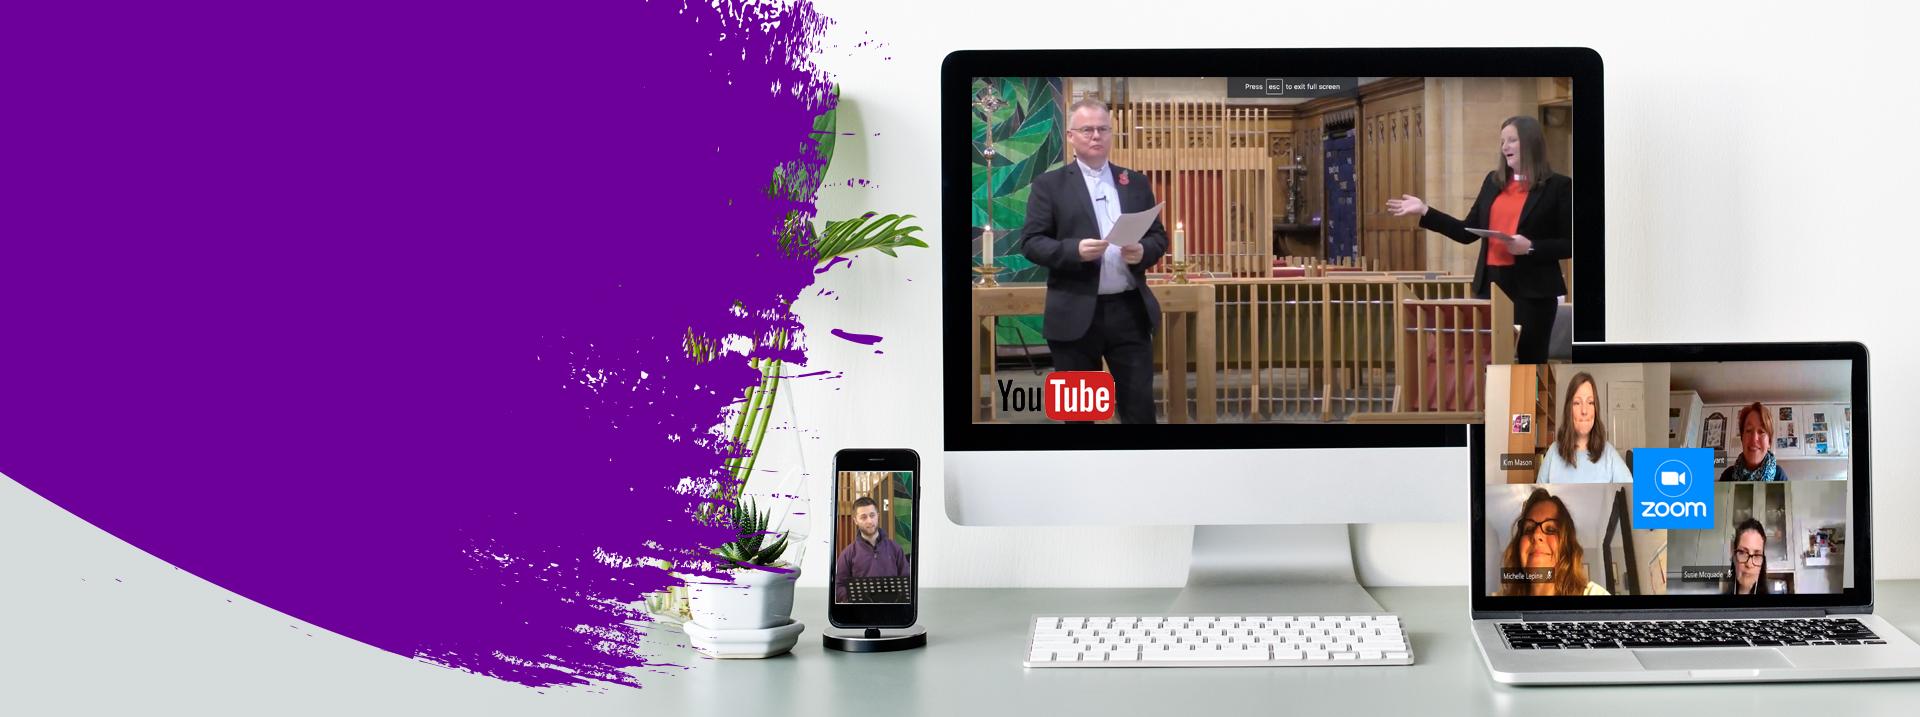 St Marks Harrogate online services